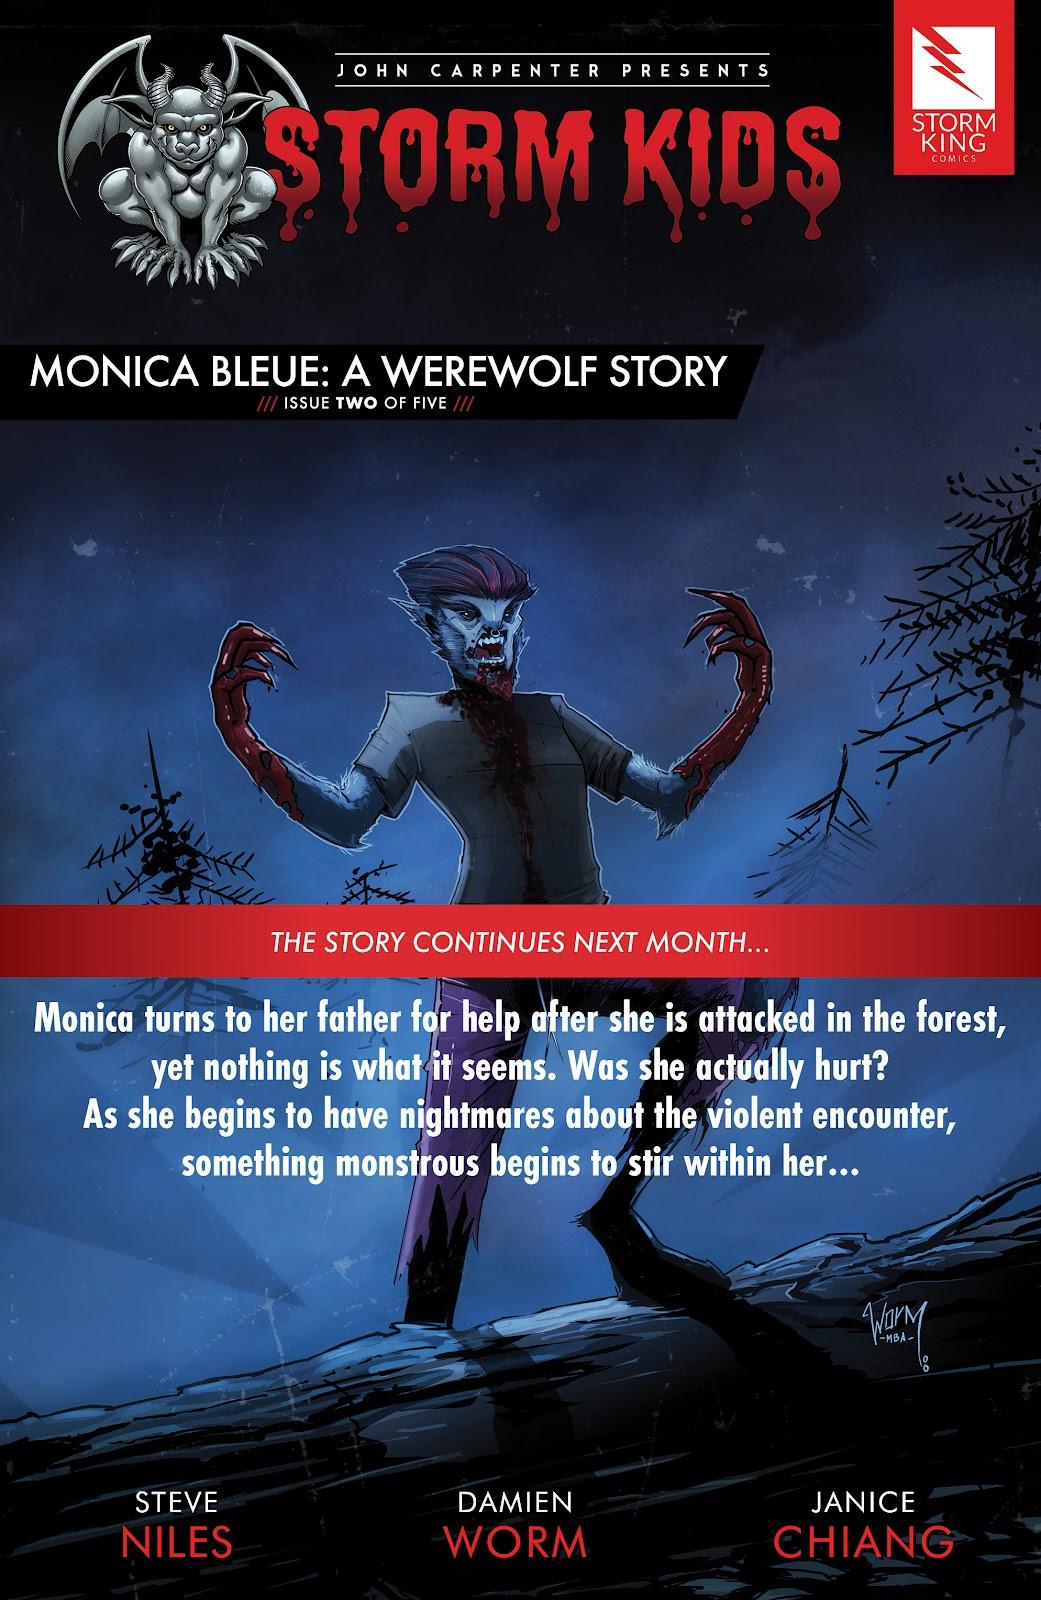 Read online John Carpenter Presents Storm Kids: Monica Bleue: A Werewolf Story comic -  Issue #1 - 25